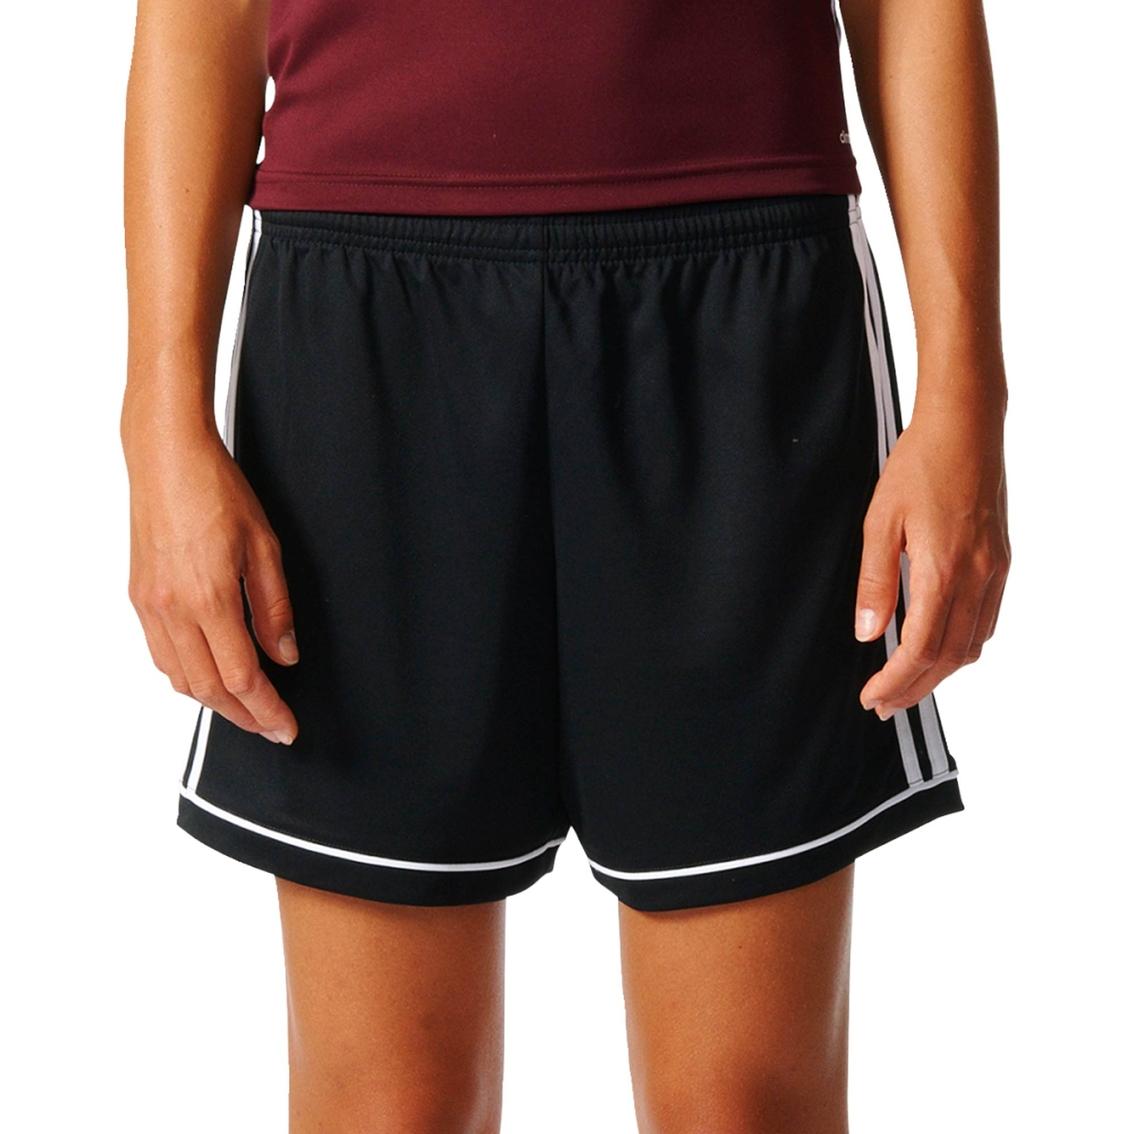 d70a09c98867 Adidas Squad 17 Shorts   Shorts   Apparel   Shop The Exchange